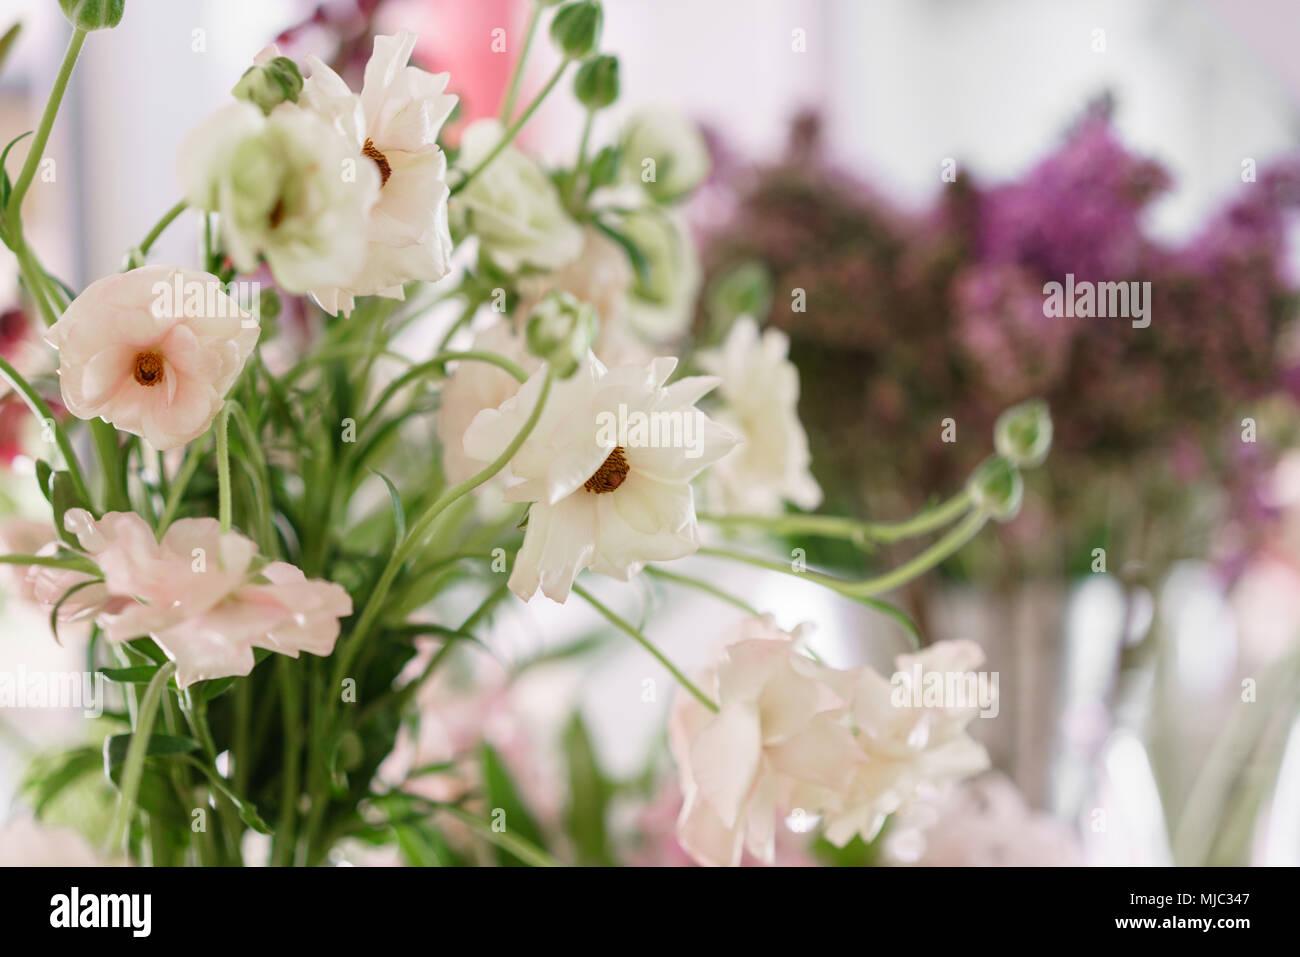 Flower Shop Concept Different Varieties Fresh Spring Flowers In